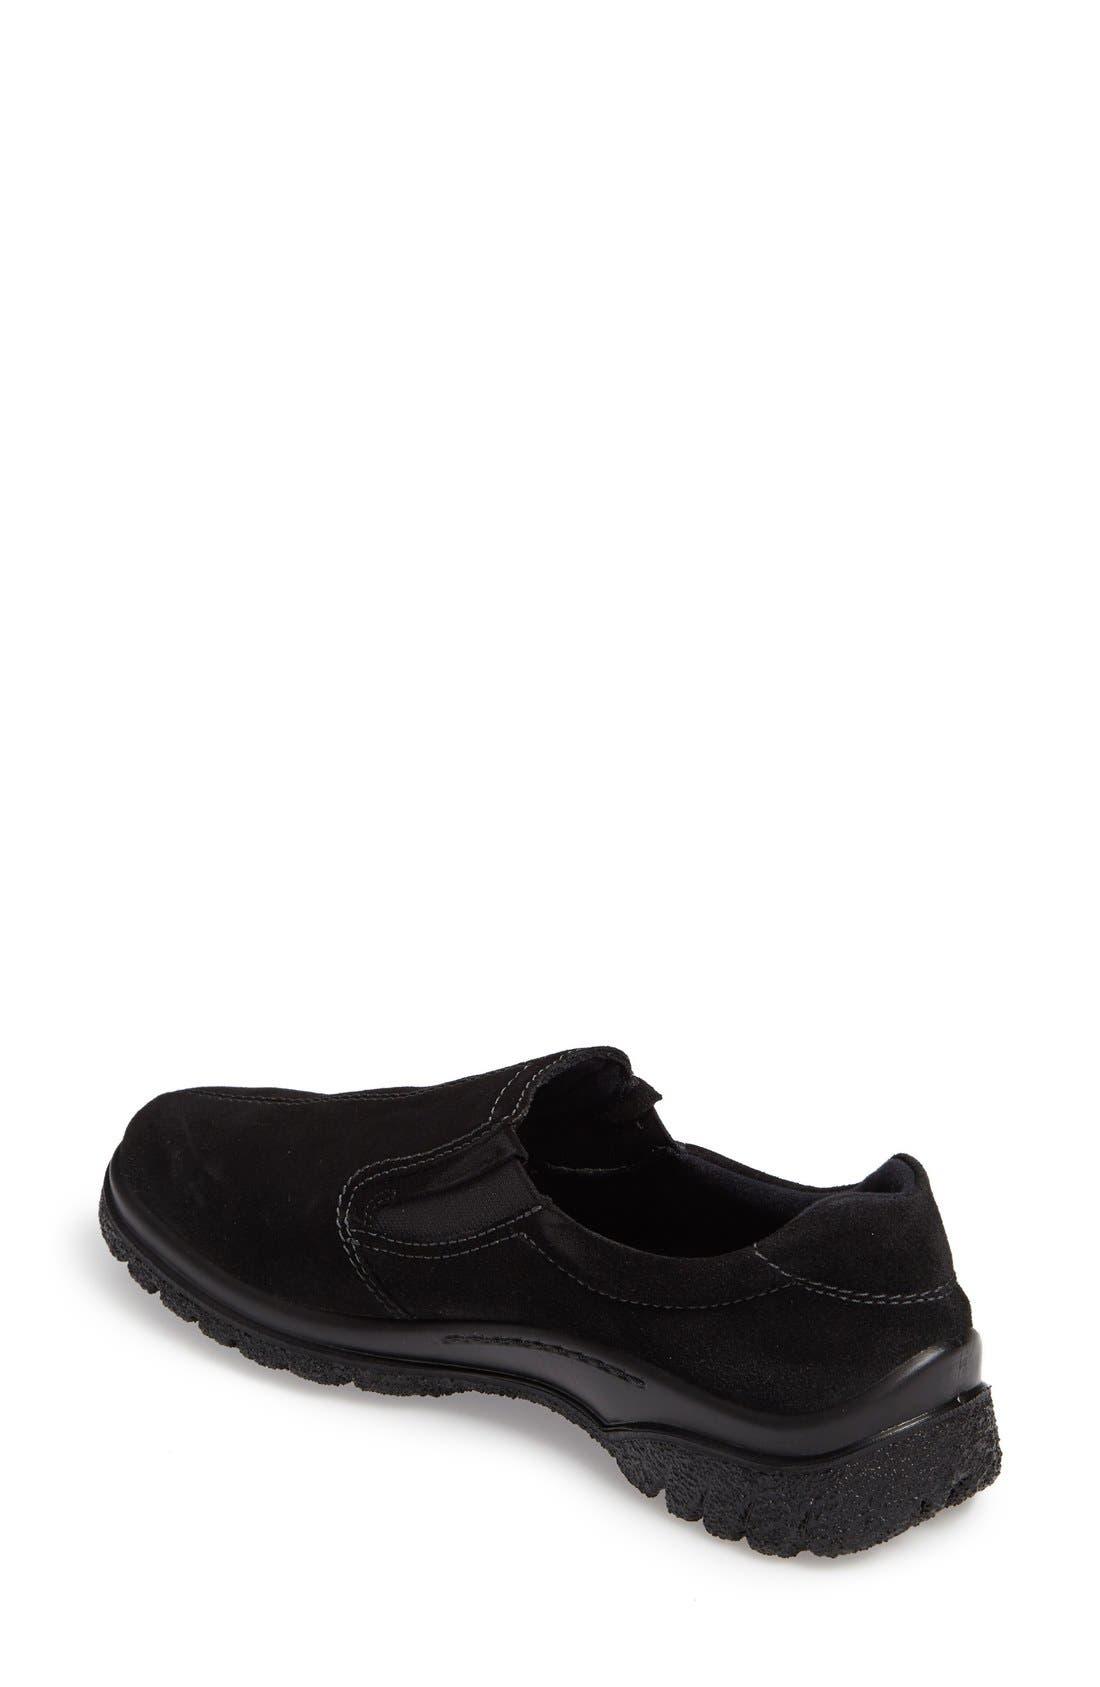 Parson Waterproof Gore-Tex<sup>®</sup> Slip-On Sneaker,                             Alternate thumbnail 6, color,                             001